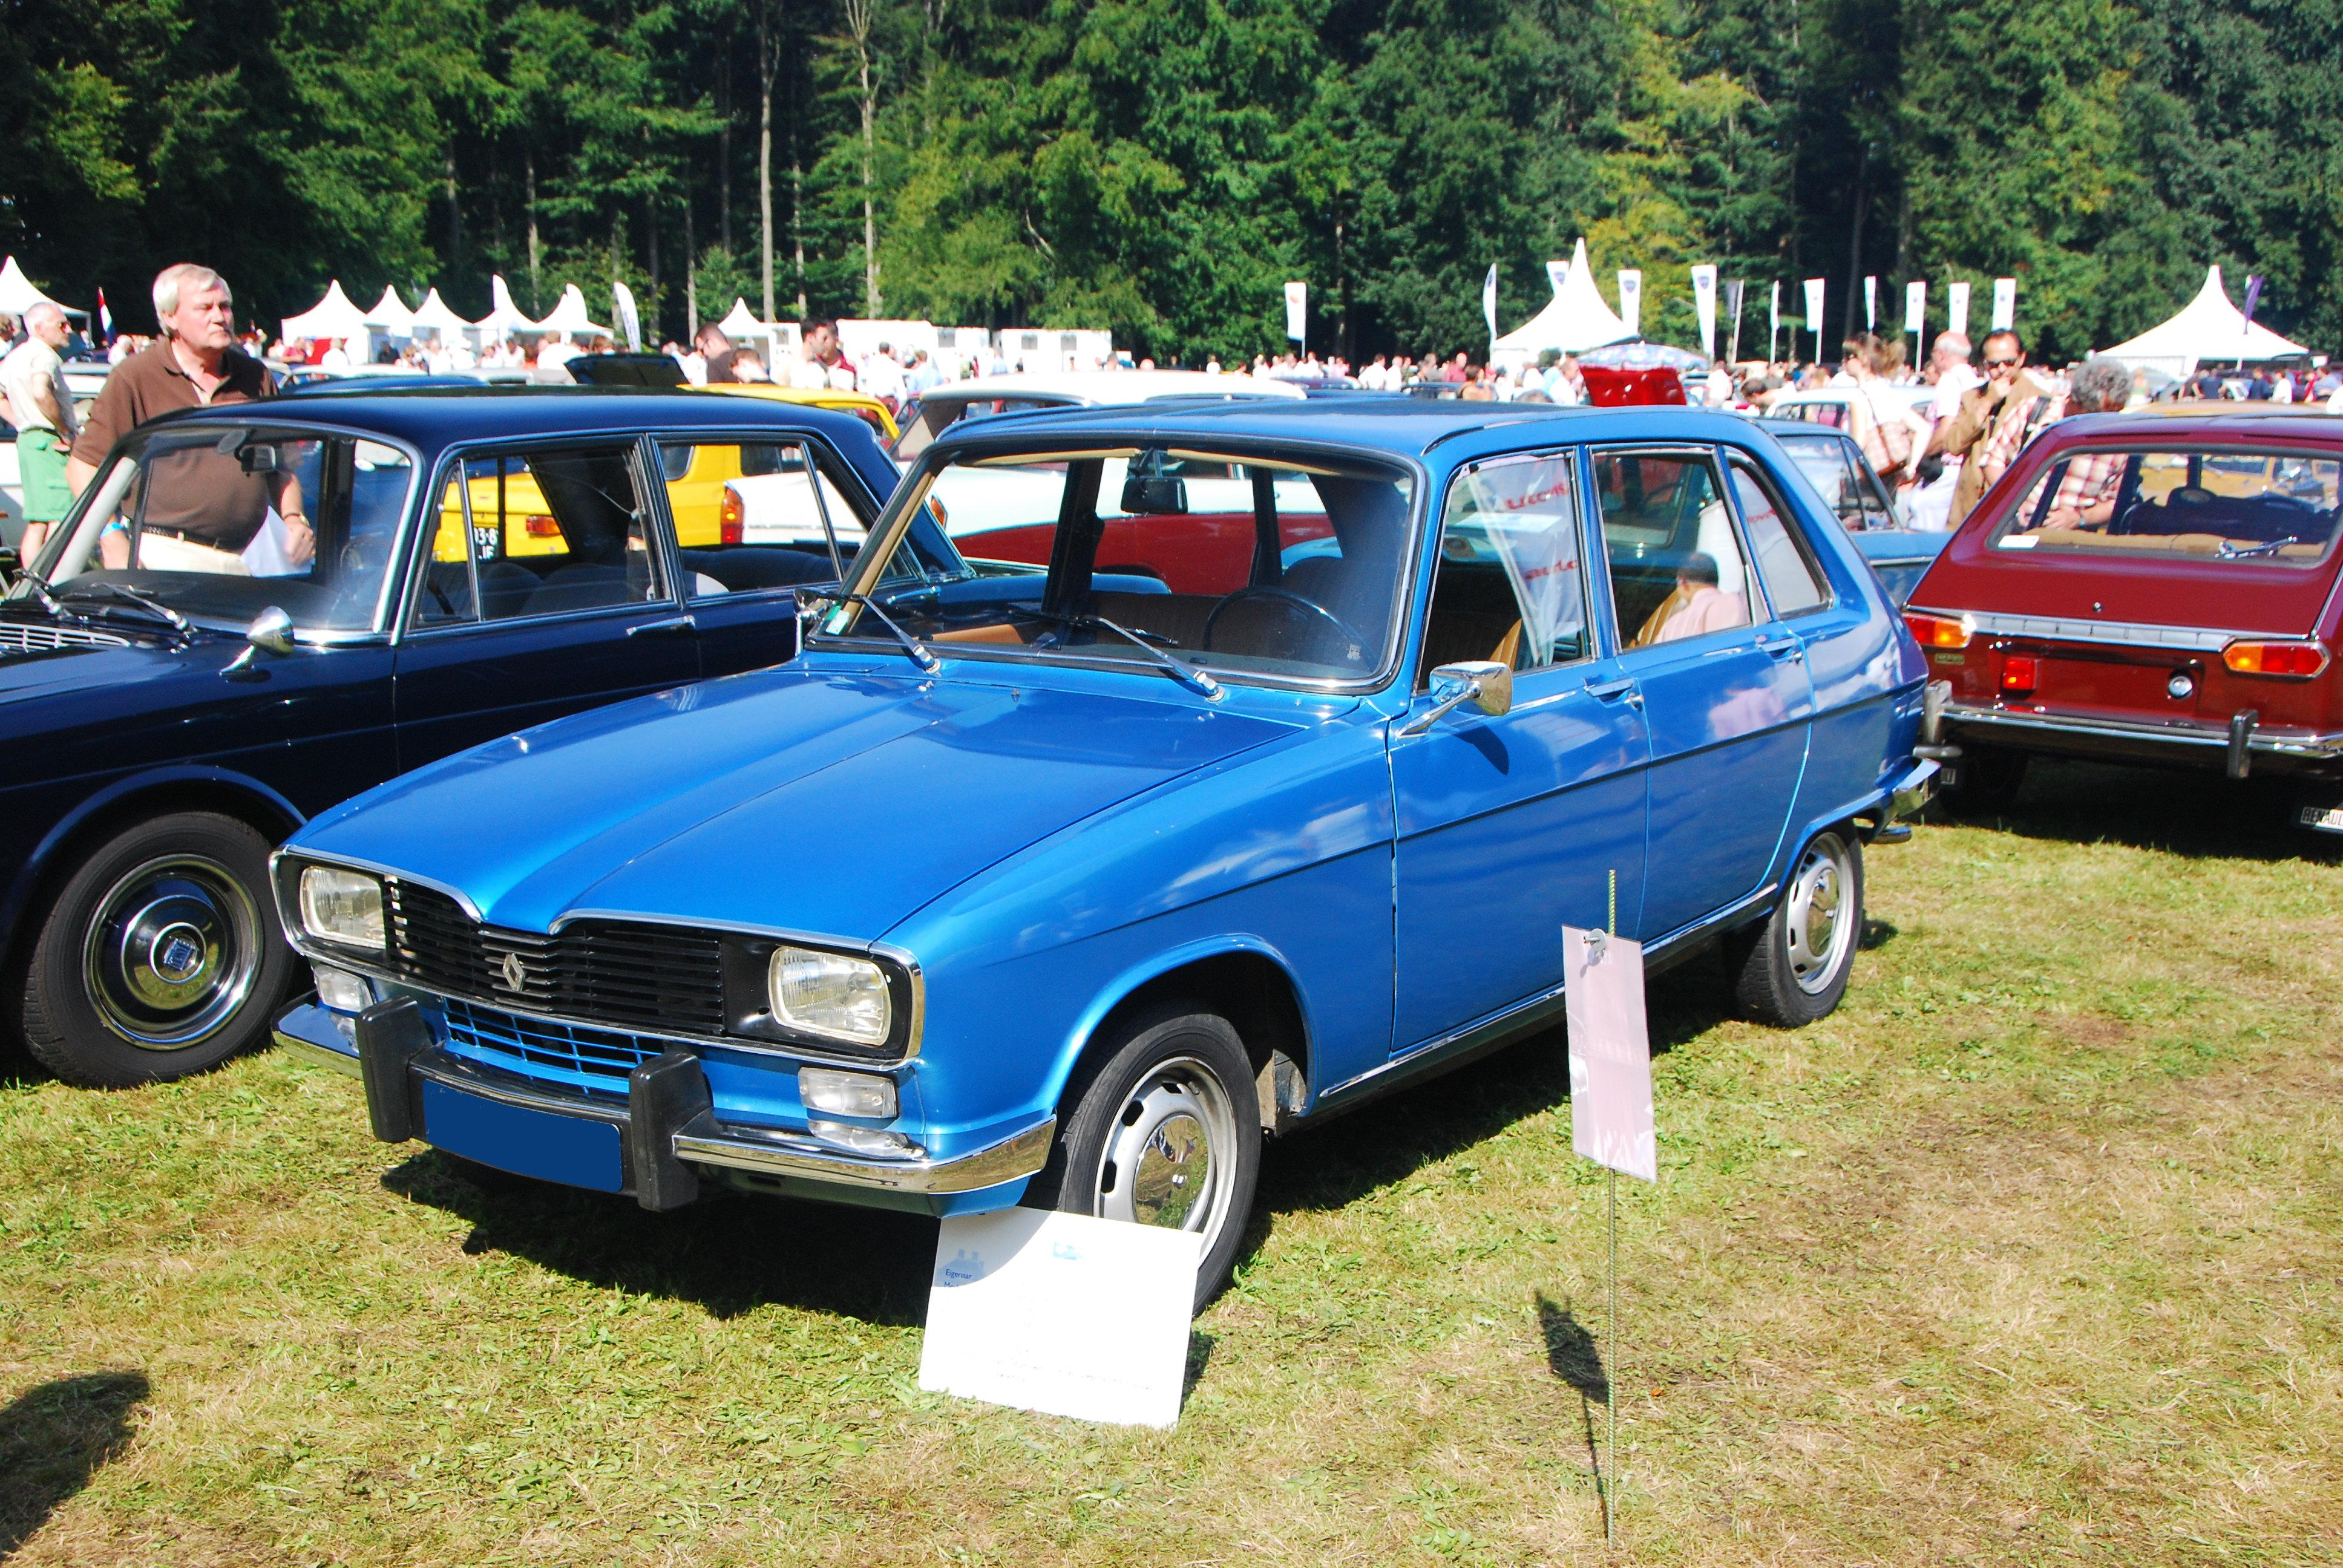 Renault 16 Tl : file renault 16 tl jpg wikimedia commons ~ Medecine-chirurgie-esthetiques.com Avis de Voitures